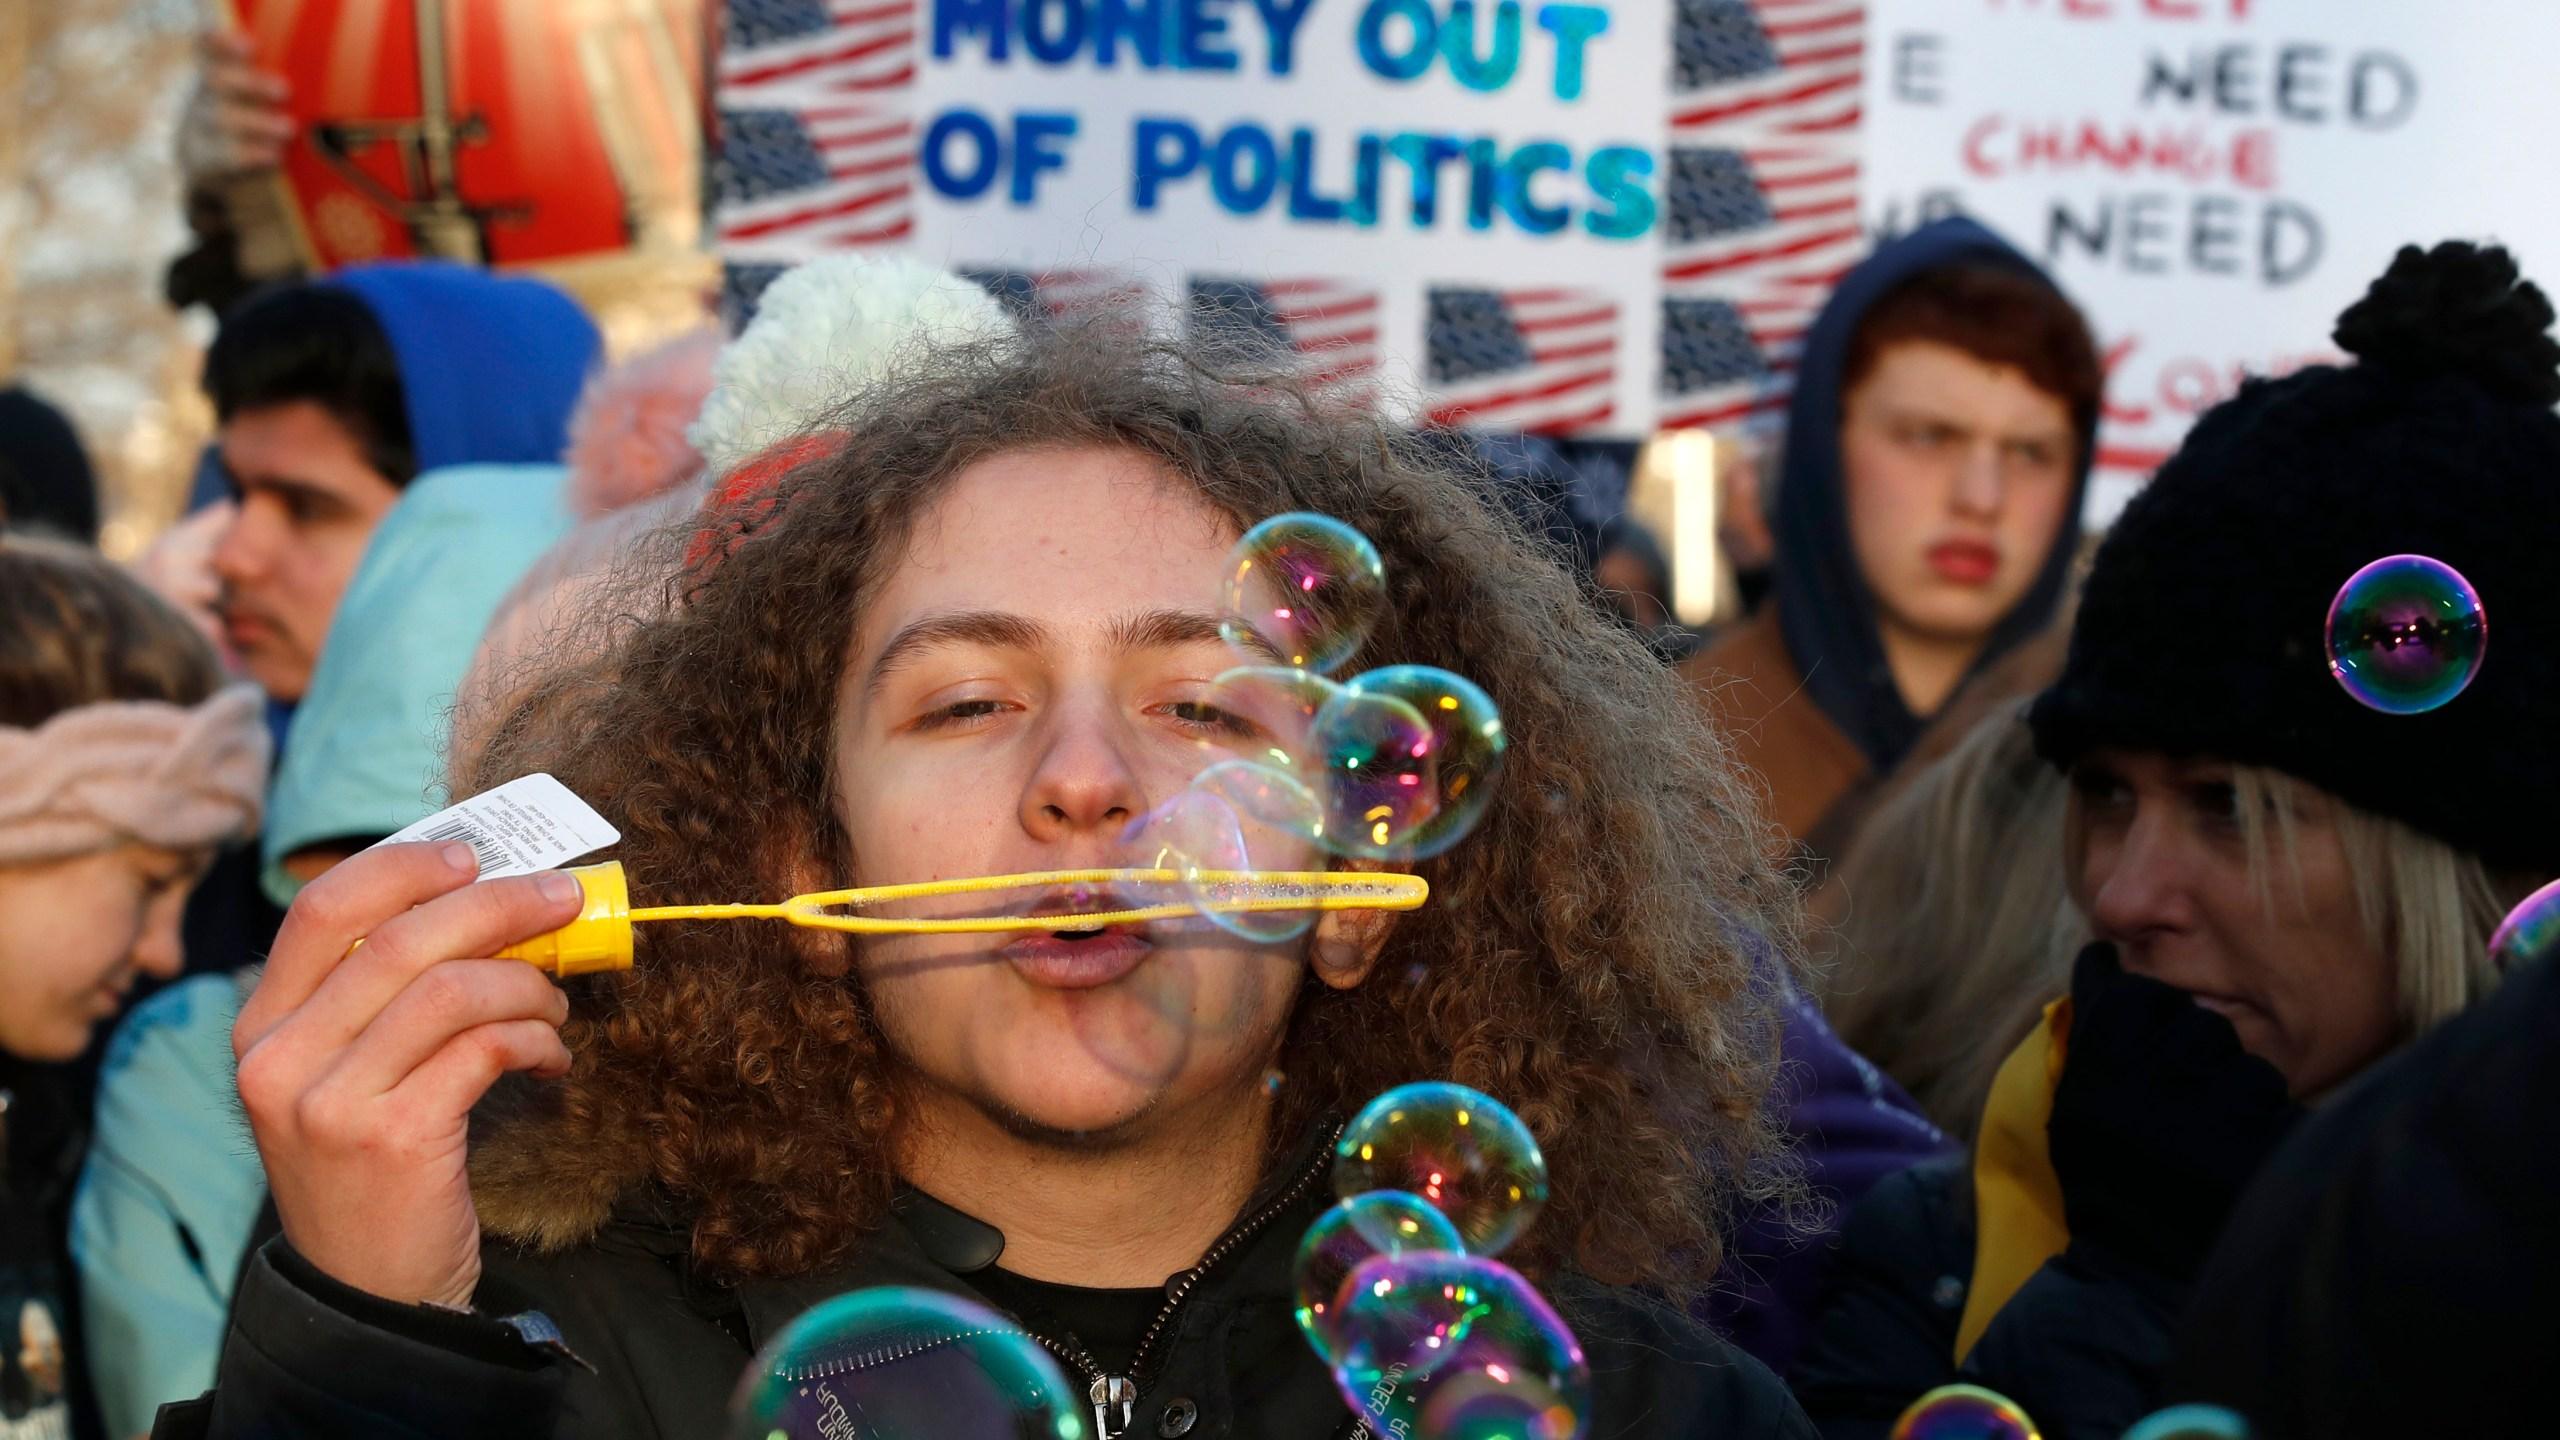 Student_Gun_Protests_43449-159532.jpg62939985